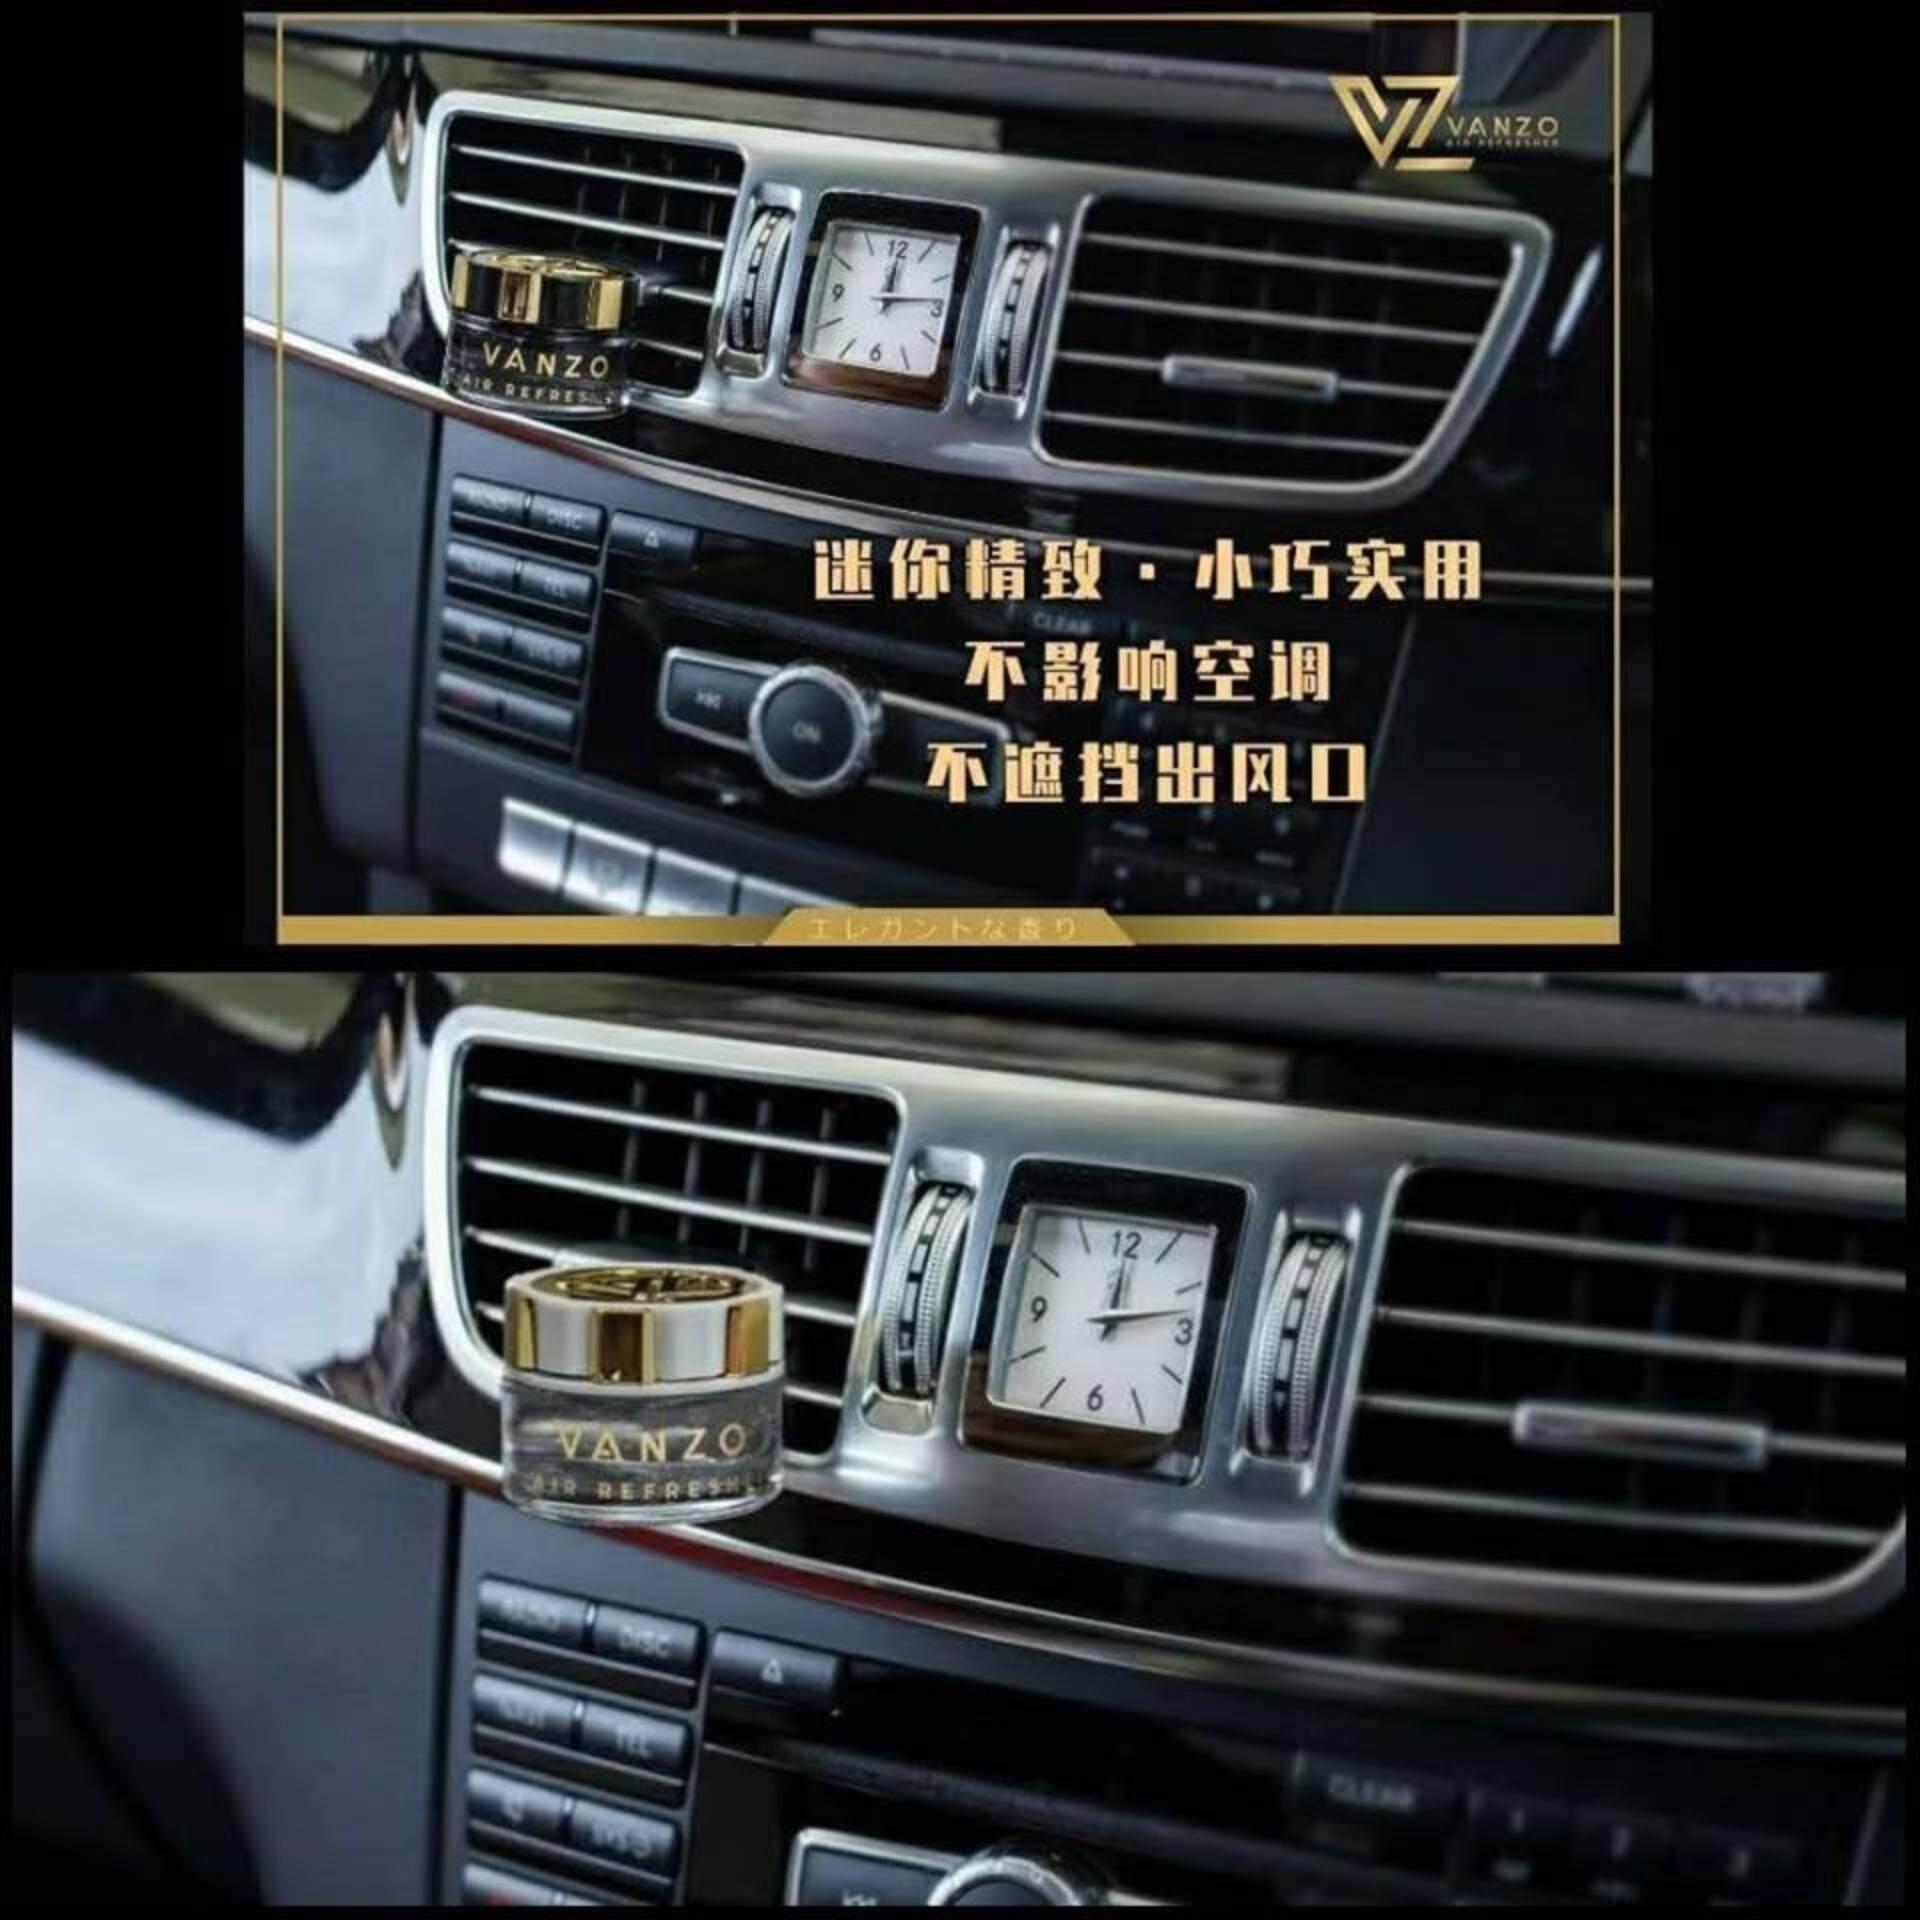 Vanzo 657 Car Perfume Velvet Musk Car Vehicle Air Refresheners Perfume 16ml (2 bottle in package)[Air-corn Clip inside]